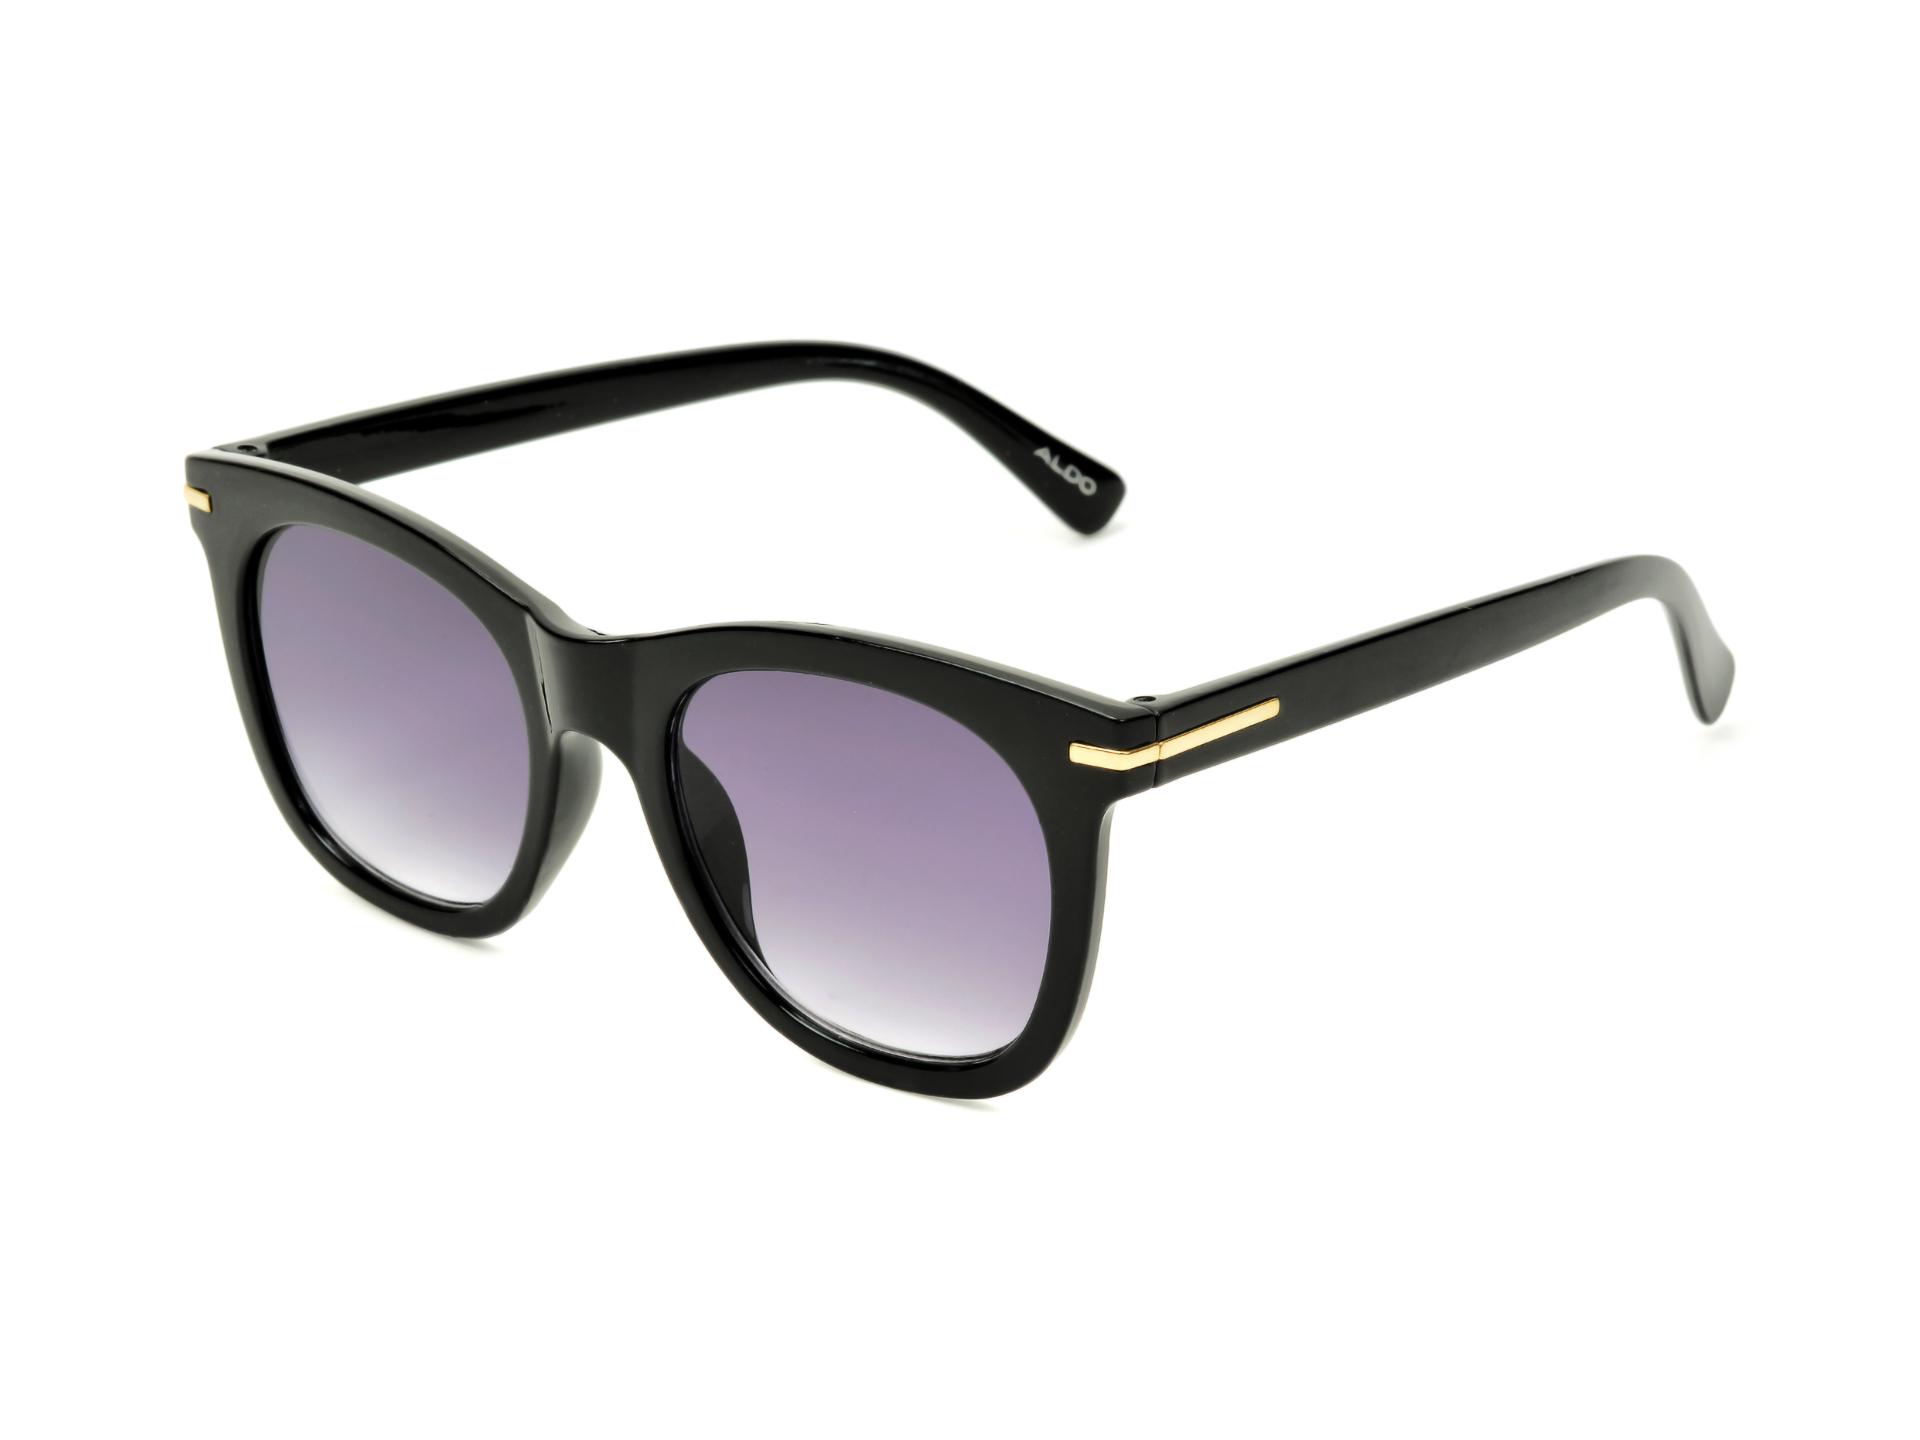 Ochelari de soare ALDO negri, Queensway970, din PVC imagine